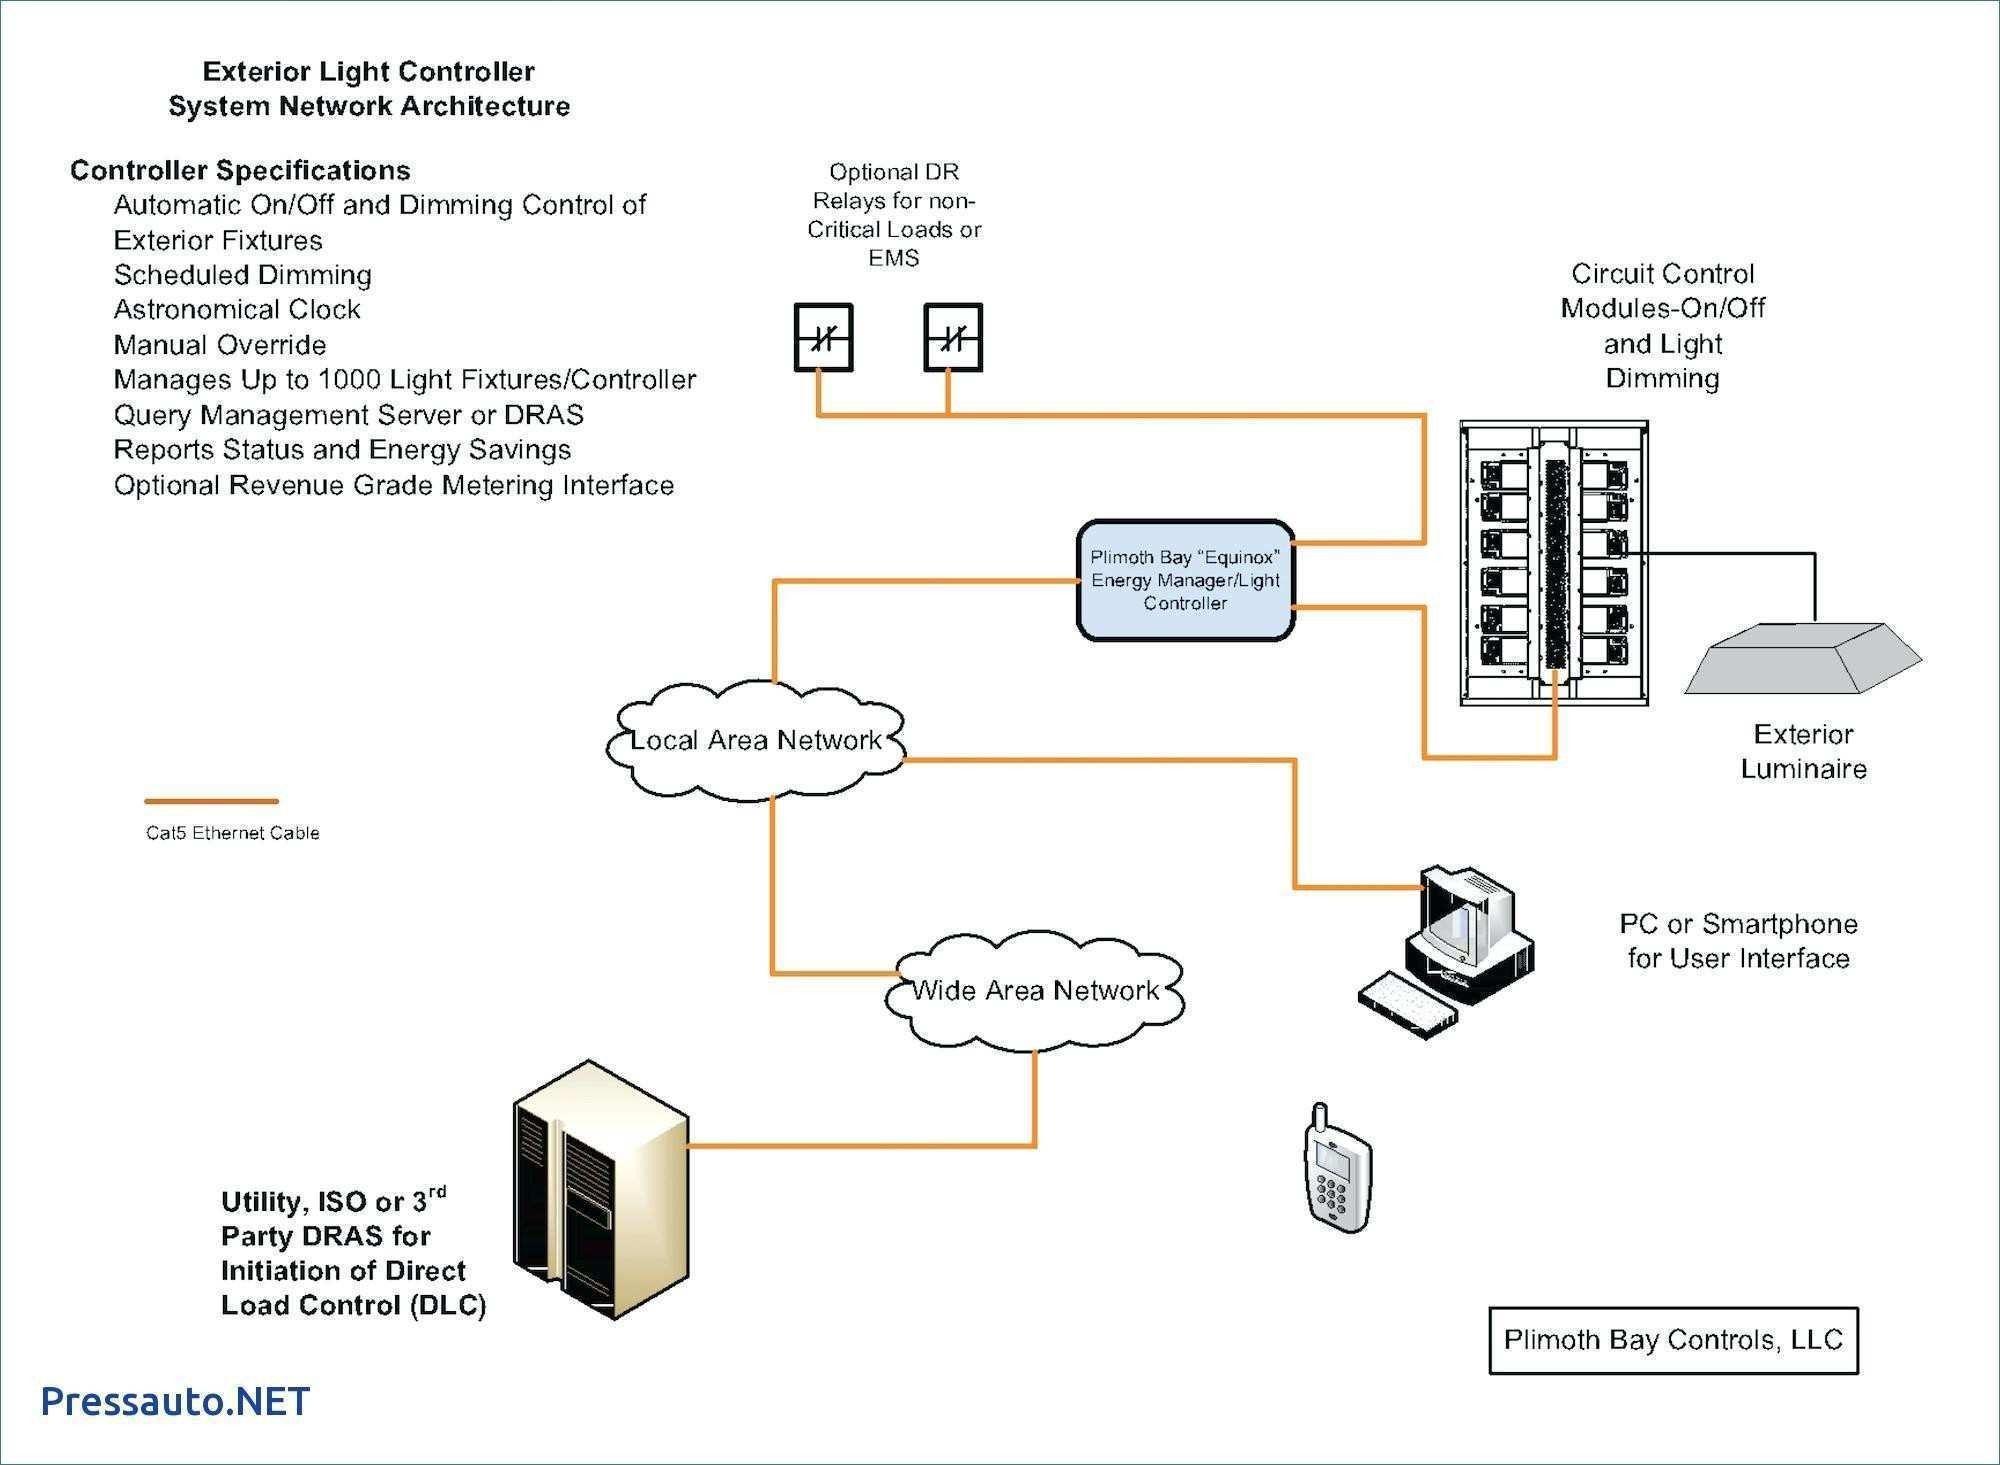 Unique Wiring Diagram App Diagram Wiringdiagram Diagramming Diagramm Visuals Visualisation Graphical Save Energy Exterior Lighting Network Architecture